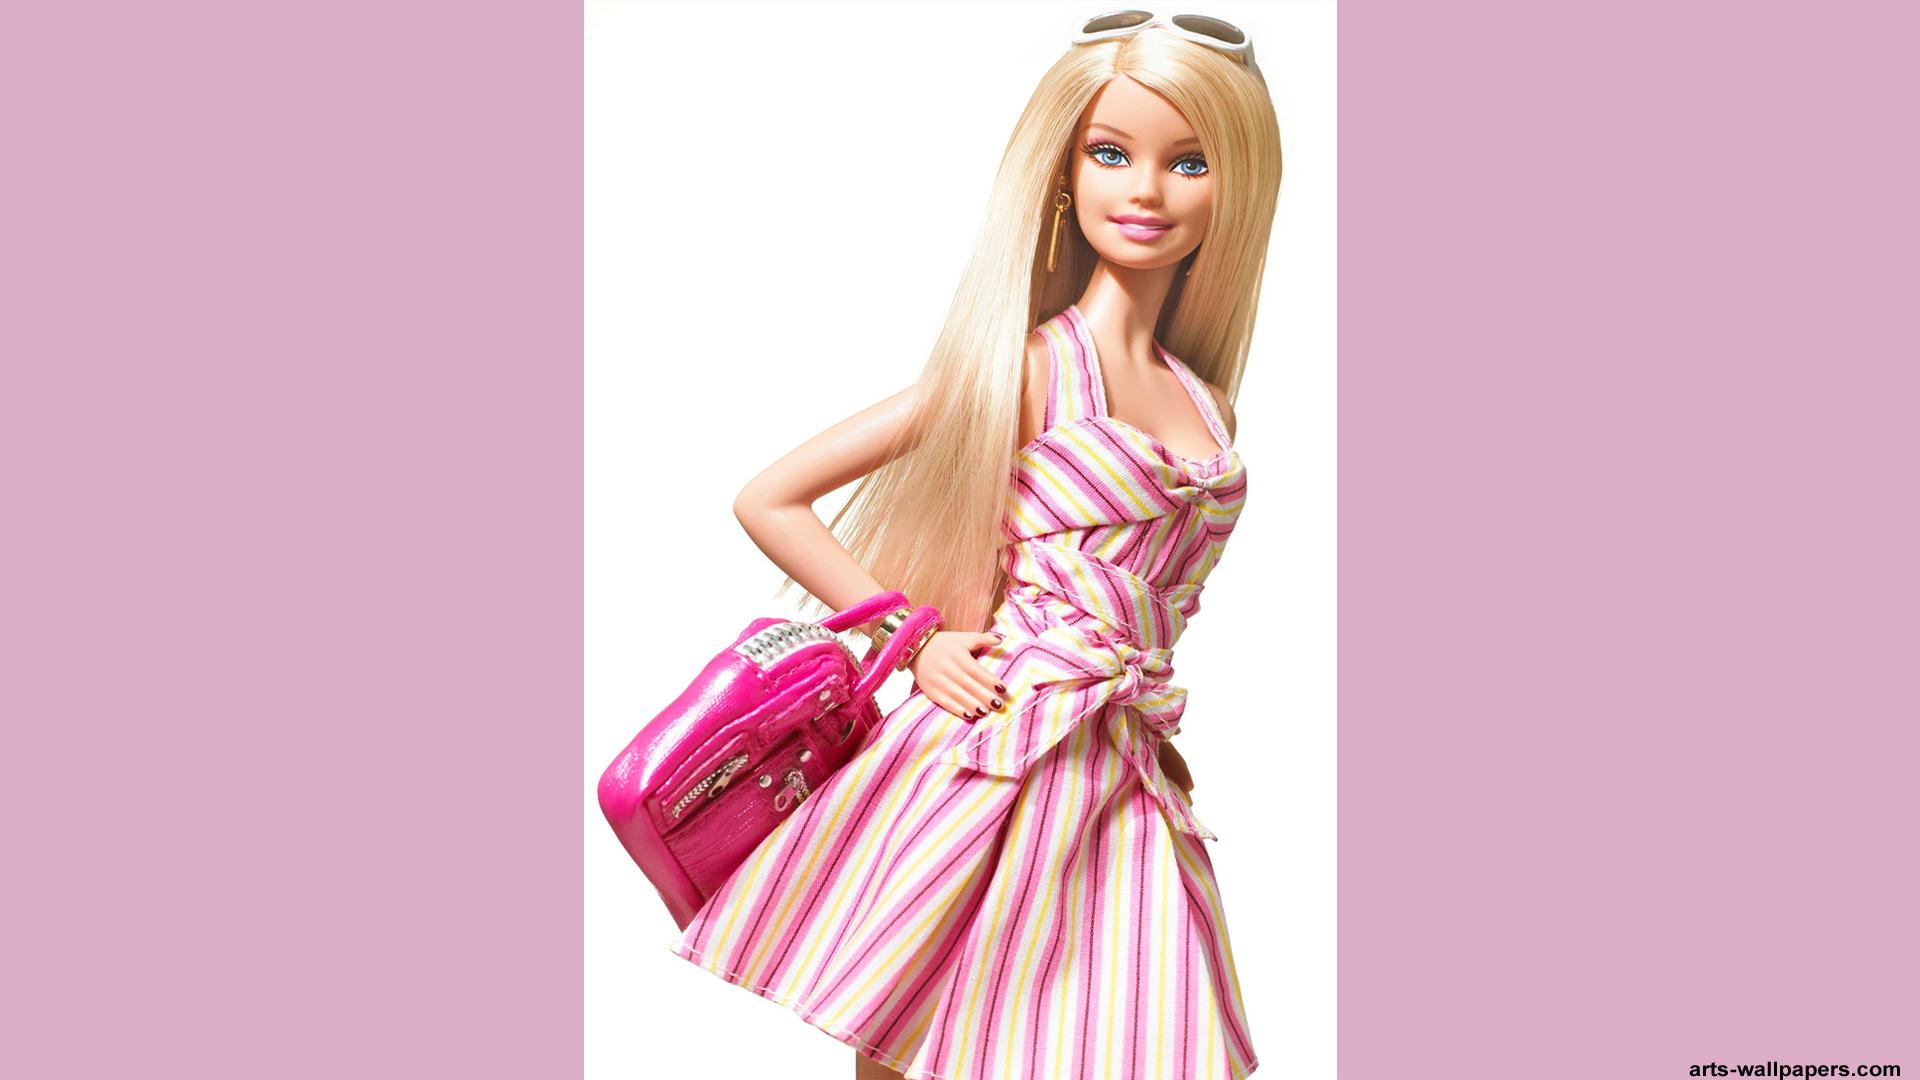 Barbie Wallpapers 1920x1080